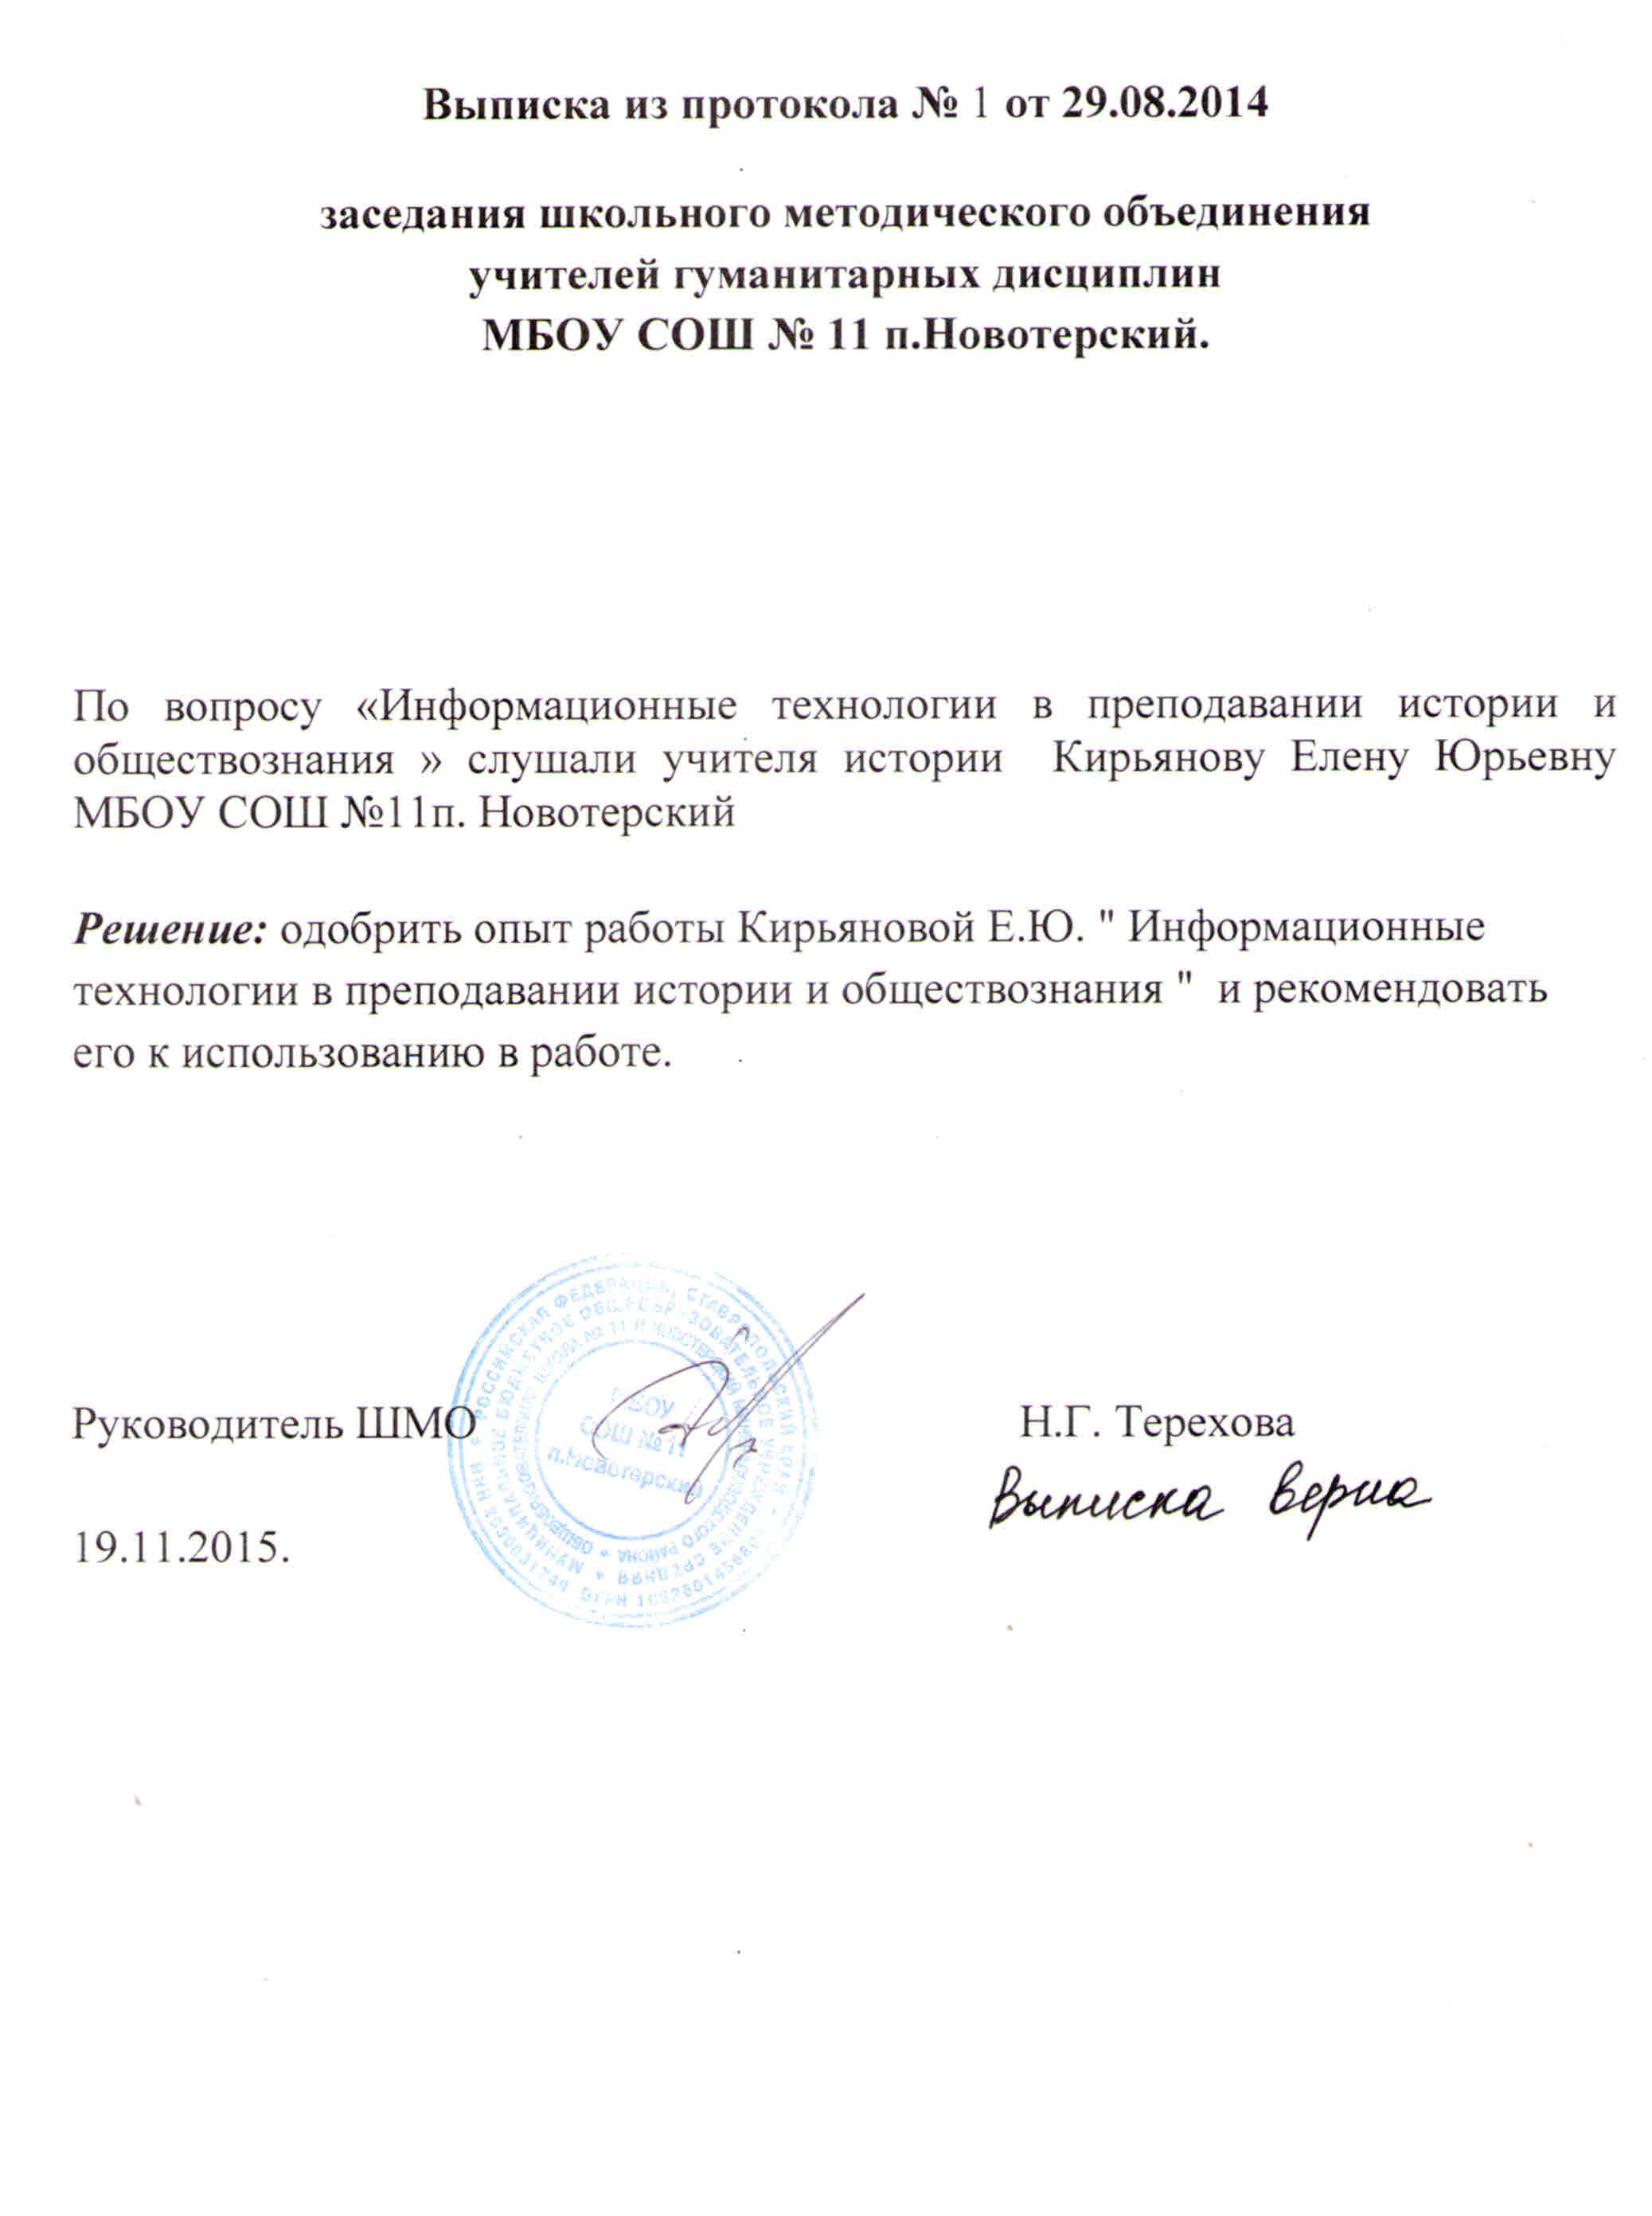 C:\Users\Сергей\Desktop\шмо\Document_11.jpg